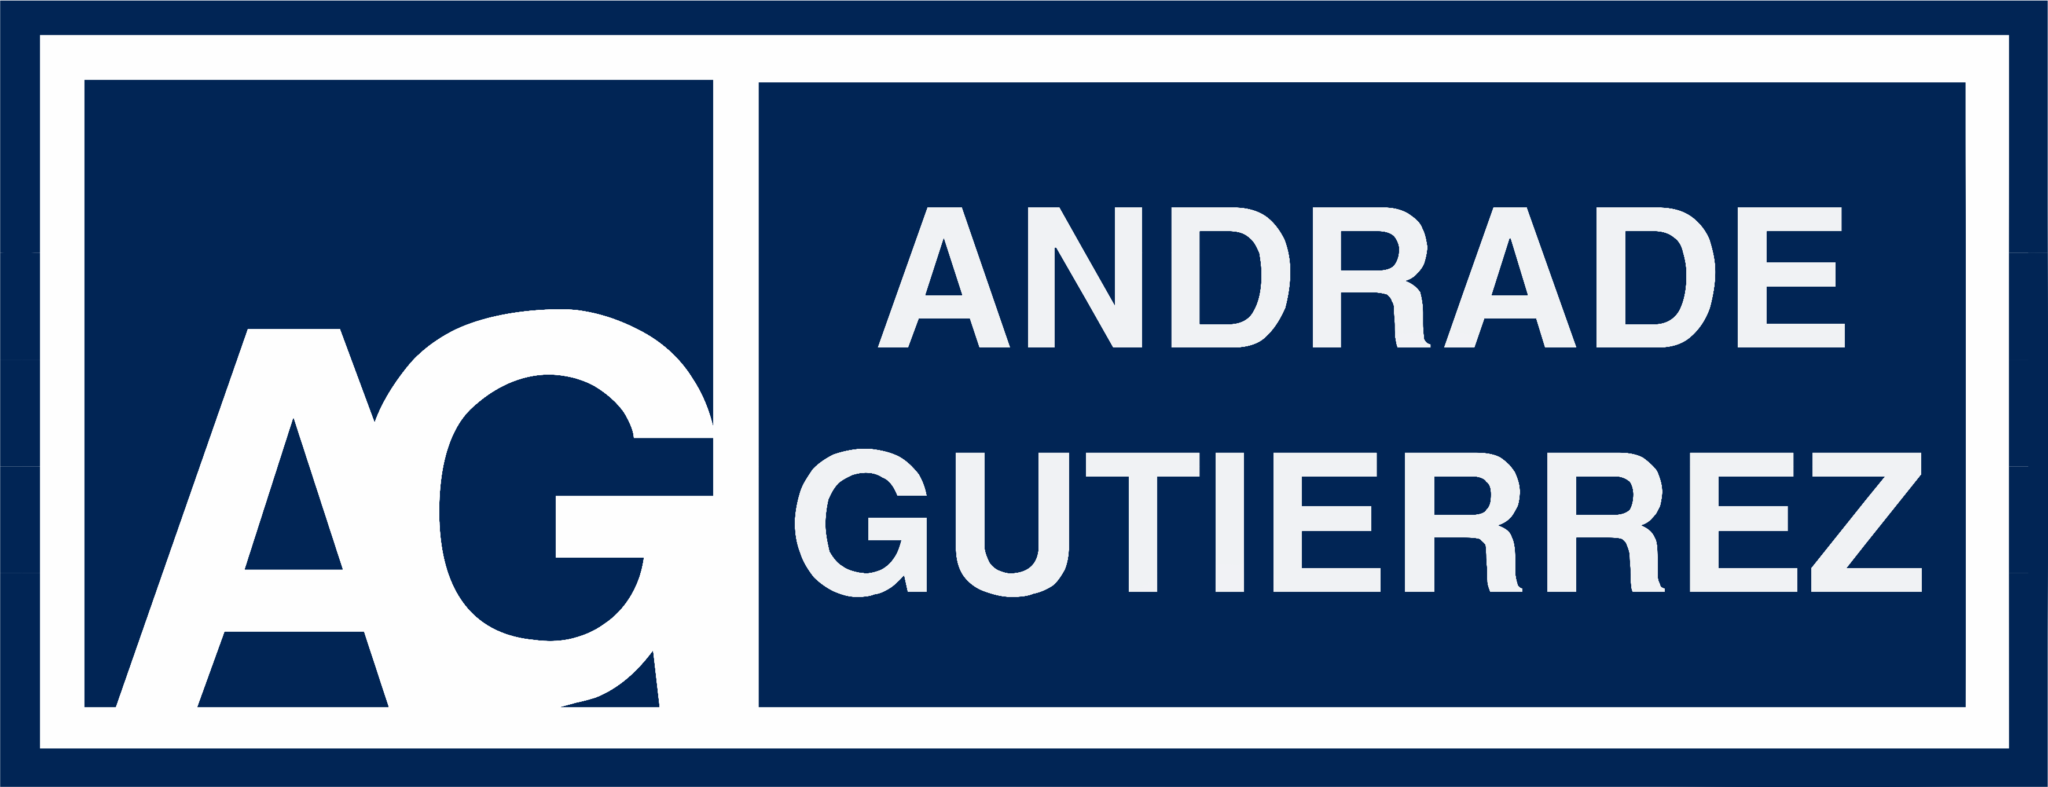 Andrade Gutierrez - Parceiros Solo Brasil Transportes